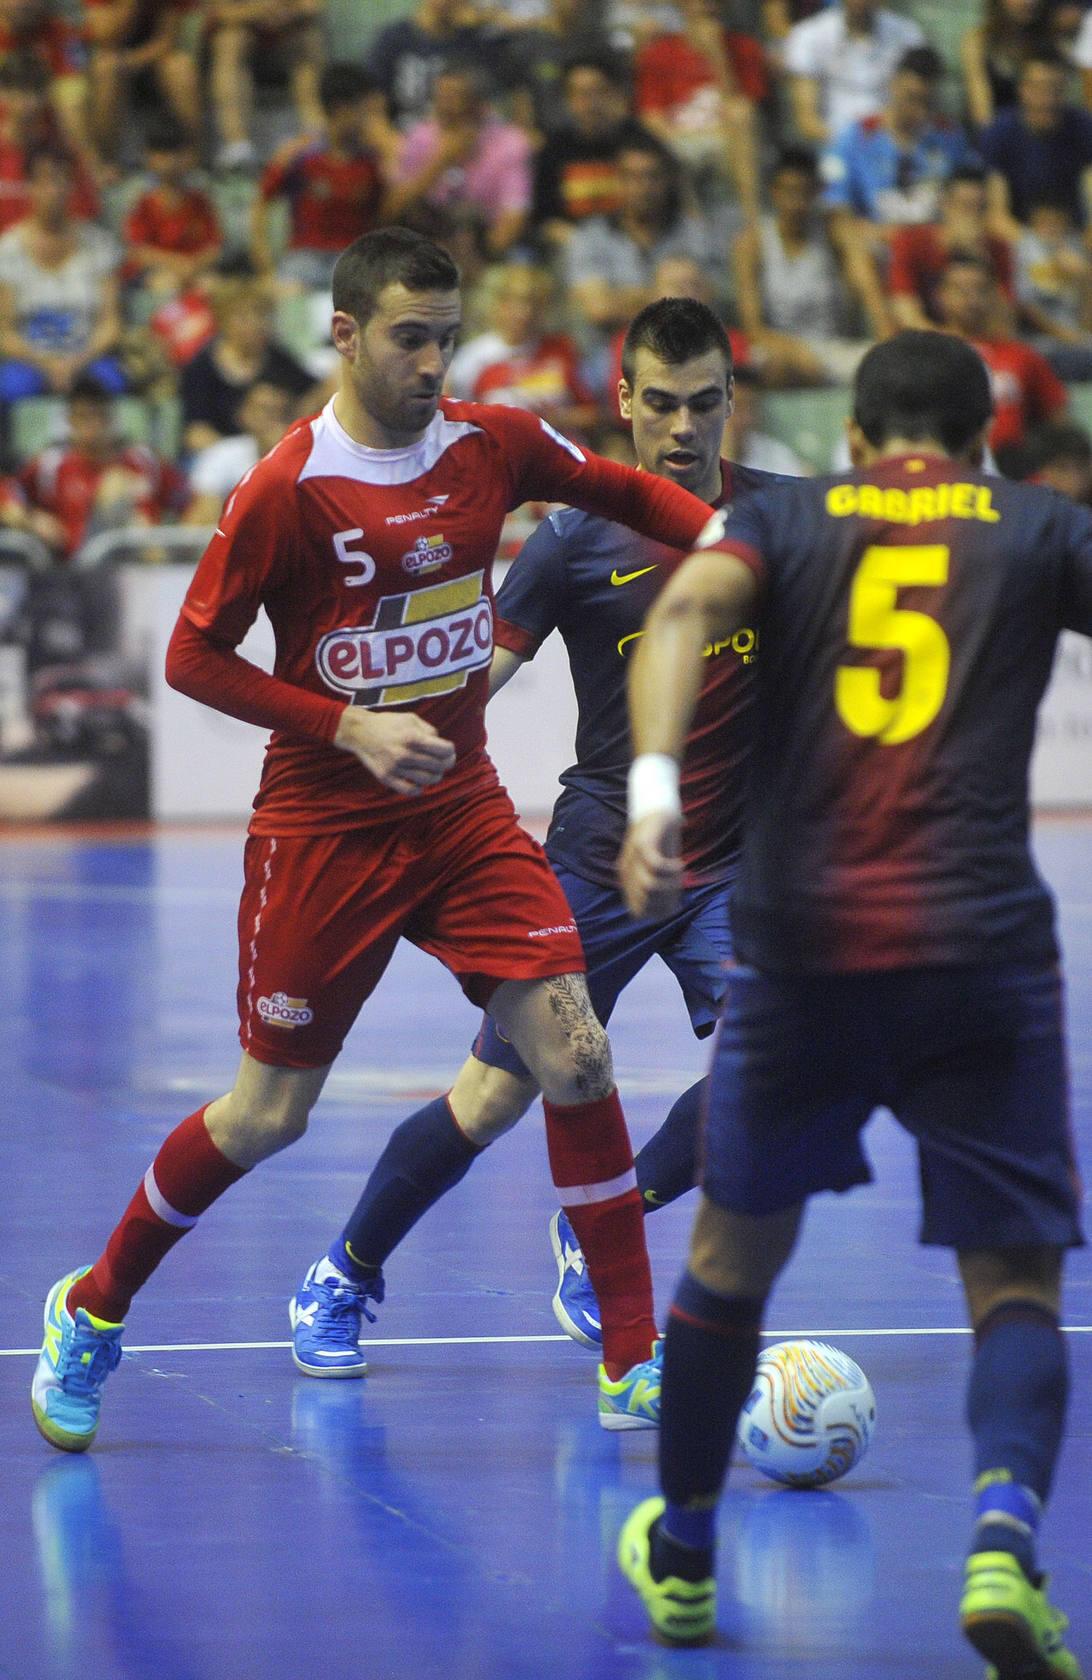 ElPozo - FC Barcelona (3-6)